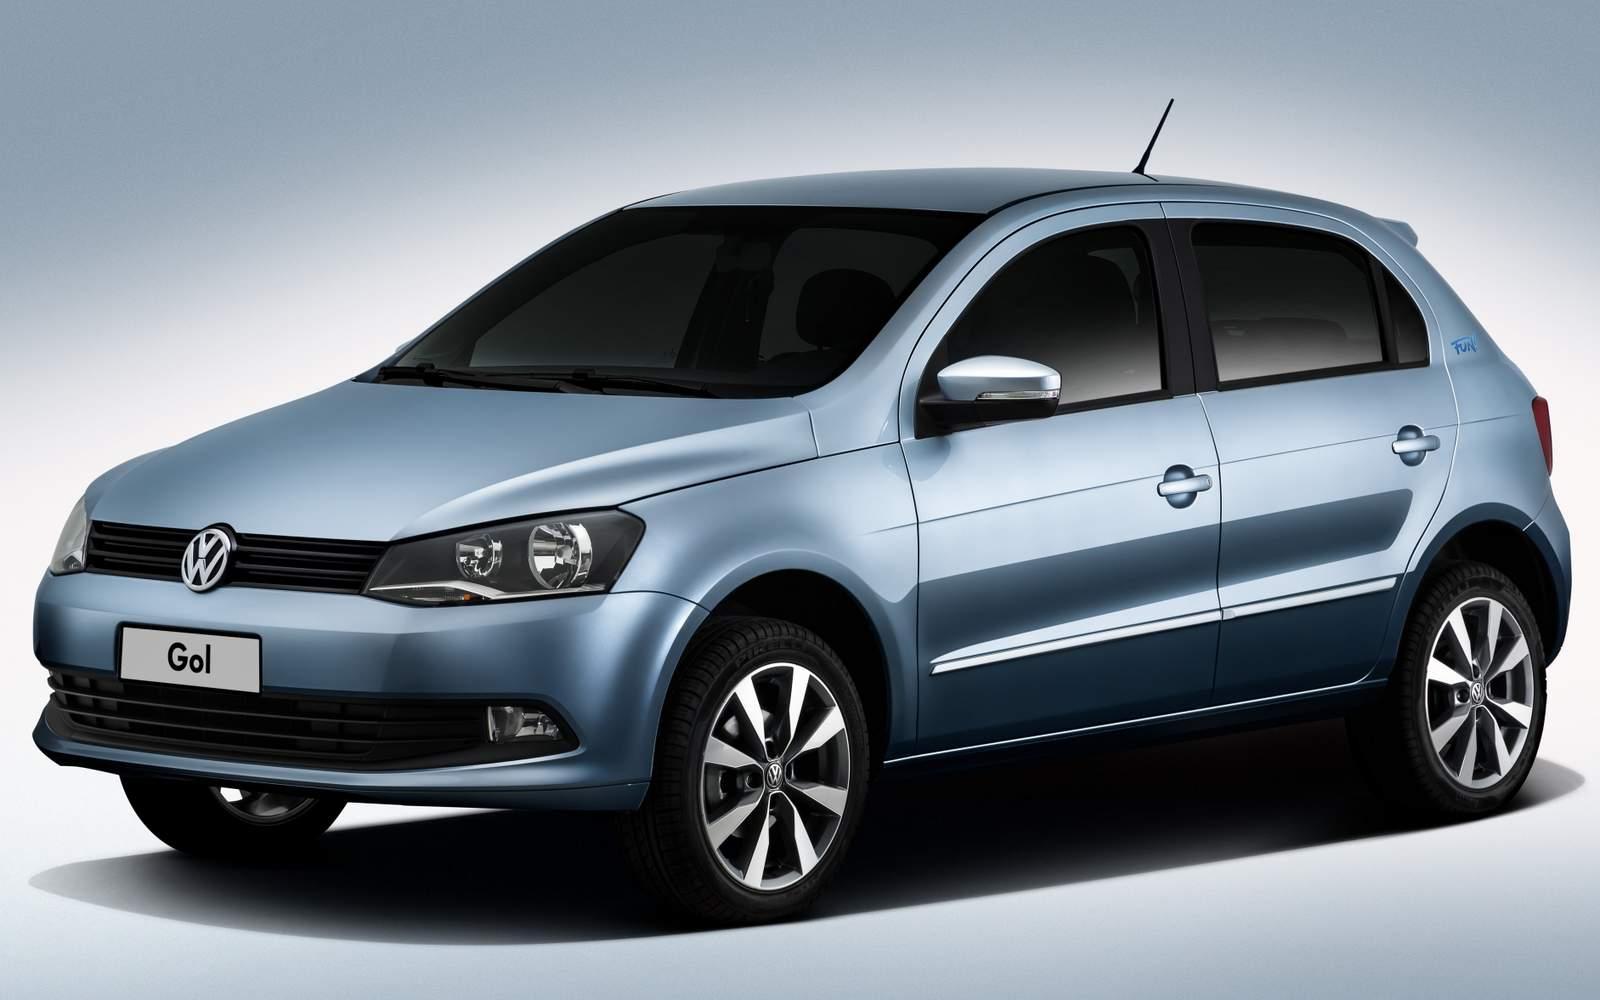 Novo VW Gol G6 2015 - Comfortline